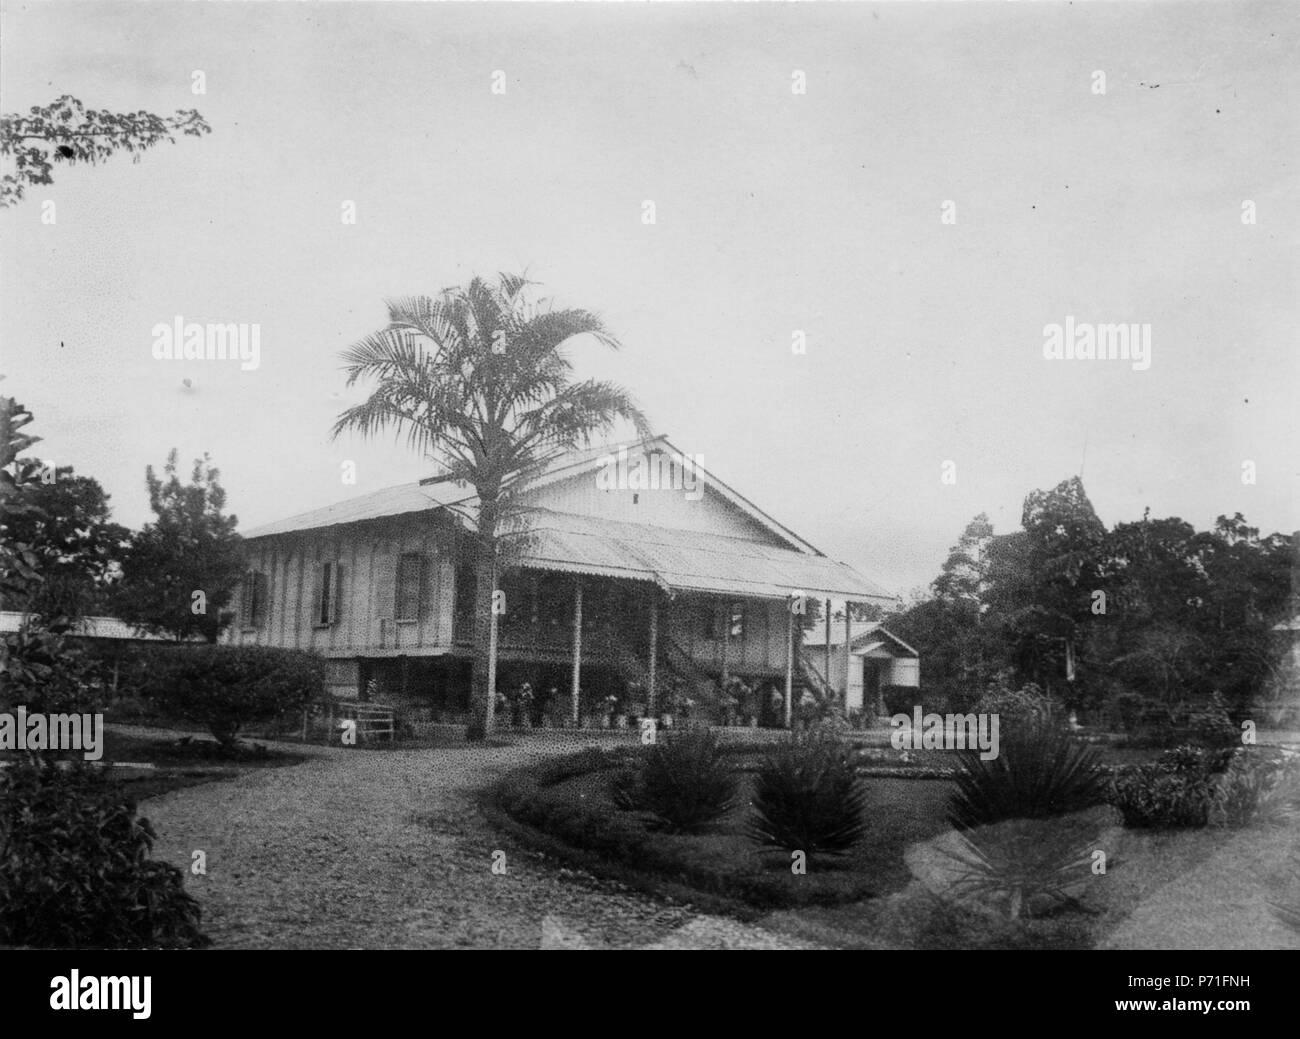 37 Kontrollörsbostaden. Kabupaten Bolaang Mongondow, Sulawesi. Indonesien - SMVK - 010683c - Stock Image